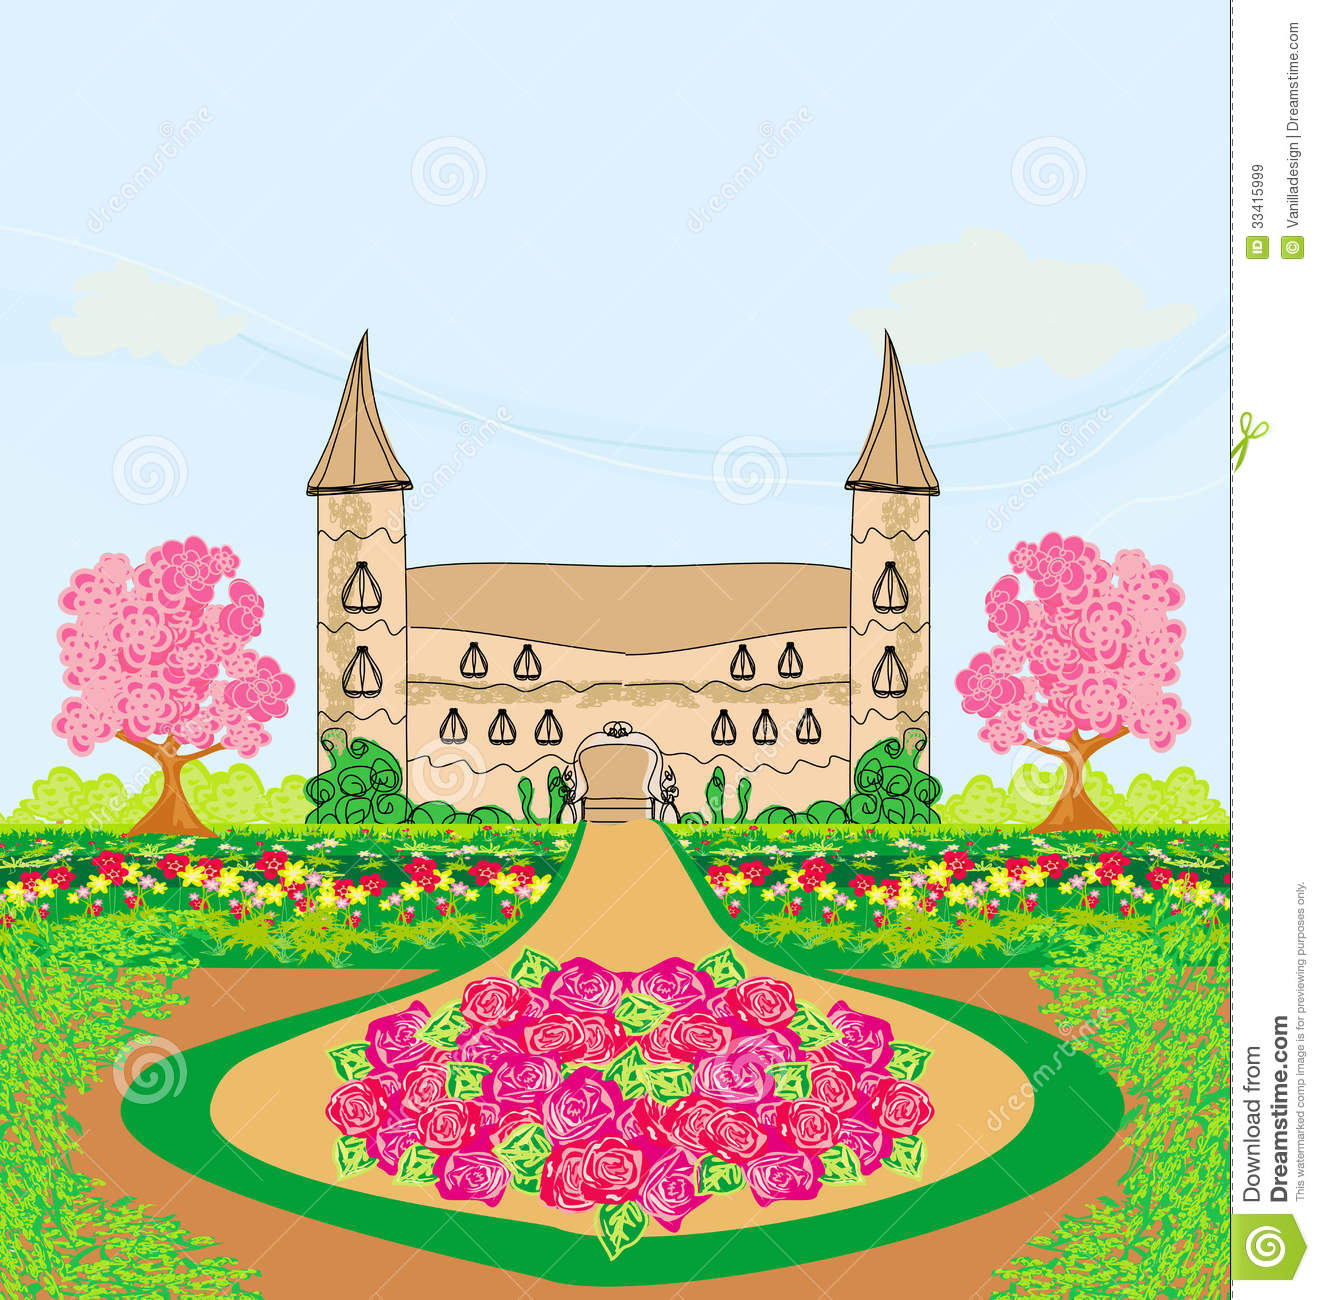 Palace clipart palace garden.